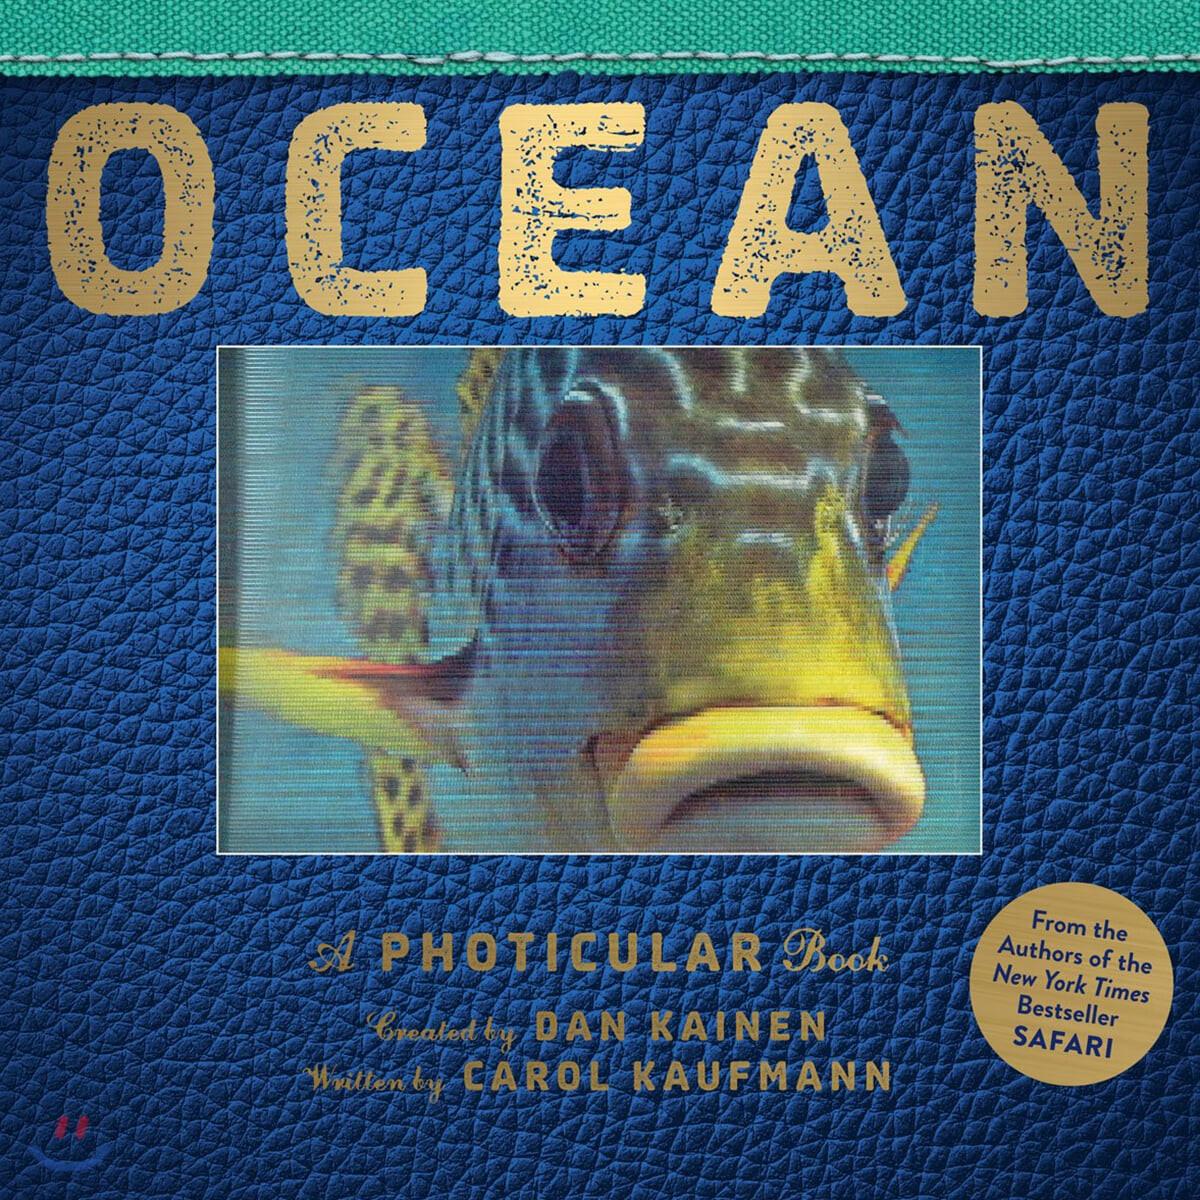 Ocean (홀로그램 / 렌티큘러 북)